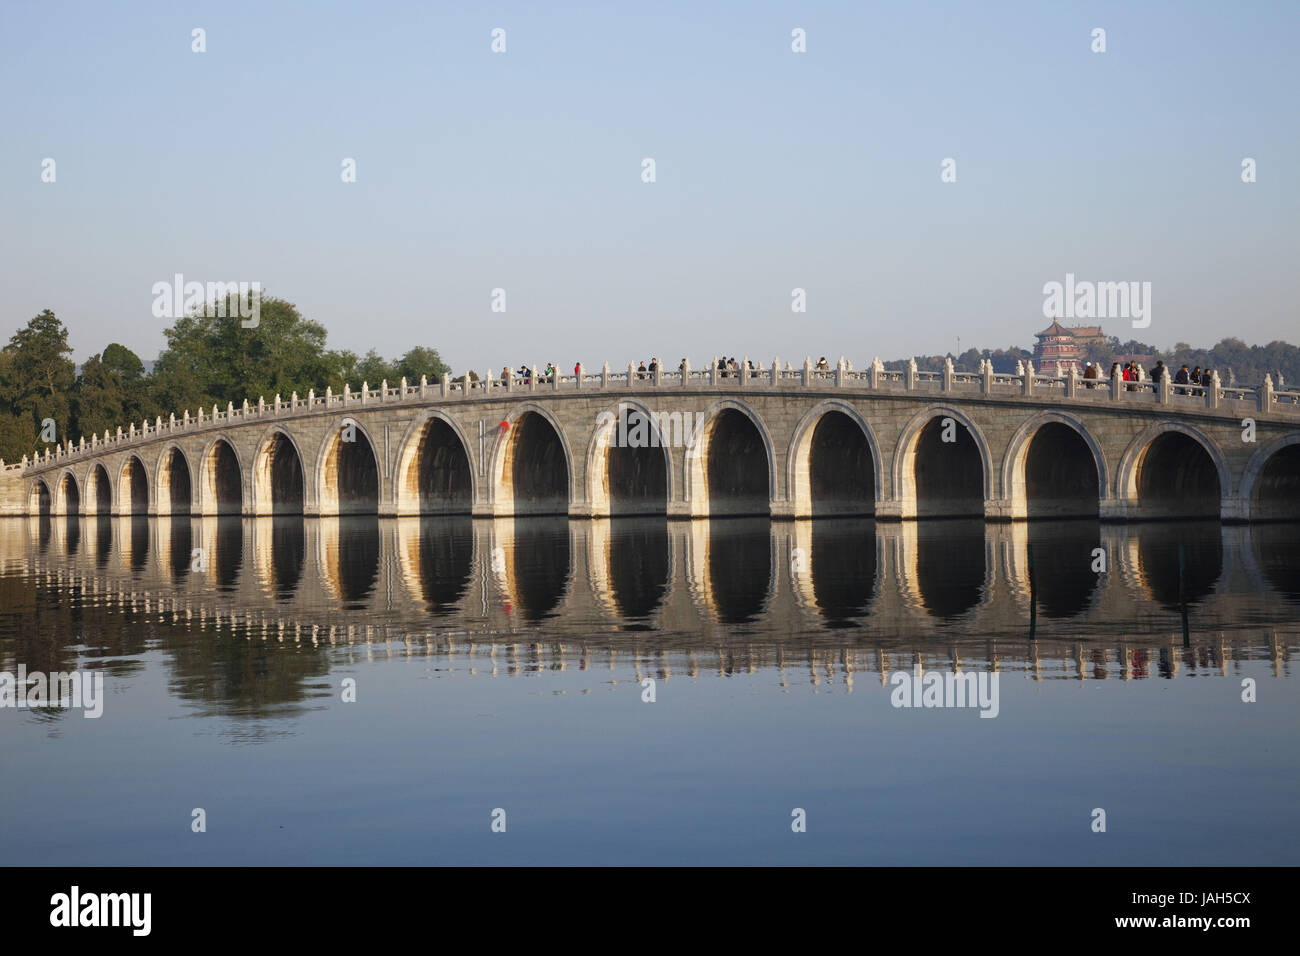 China,Peking,summer palace,seventeen-bow bridge, - Stock Image